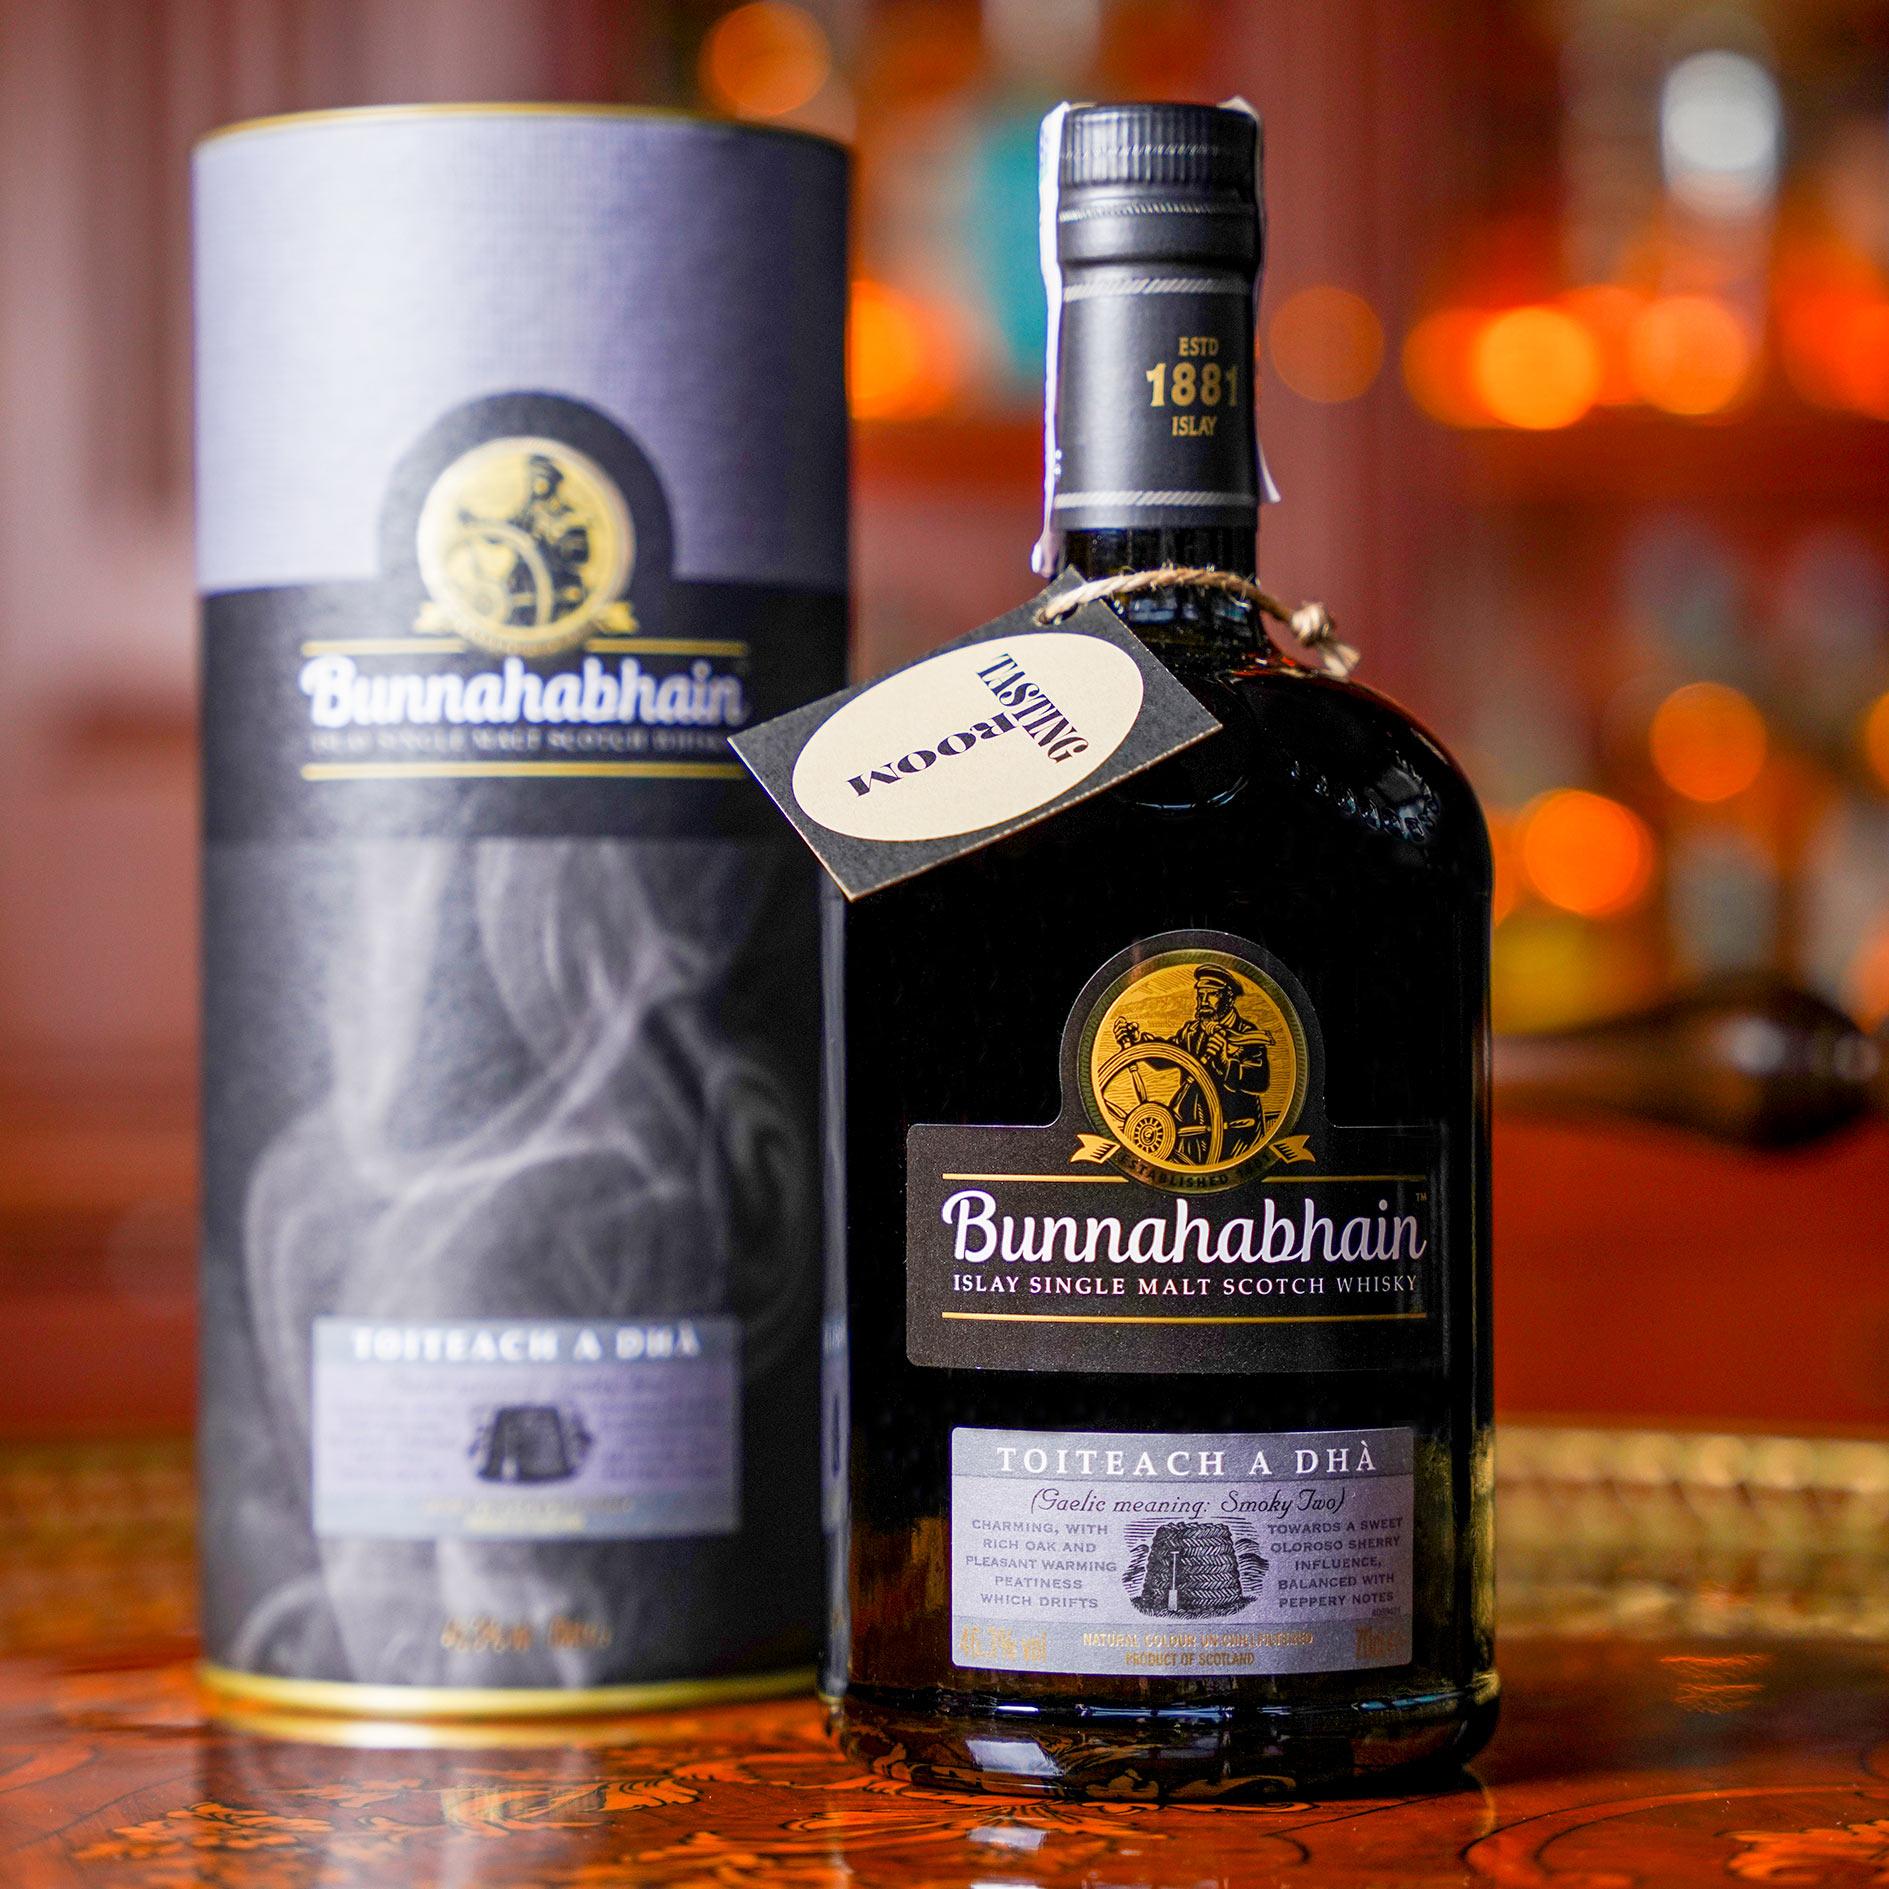 Bunnahabhain Toiteach a Dhà /Бунахабън Тойчах A Да